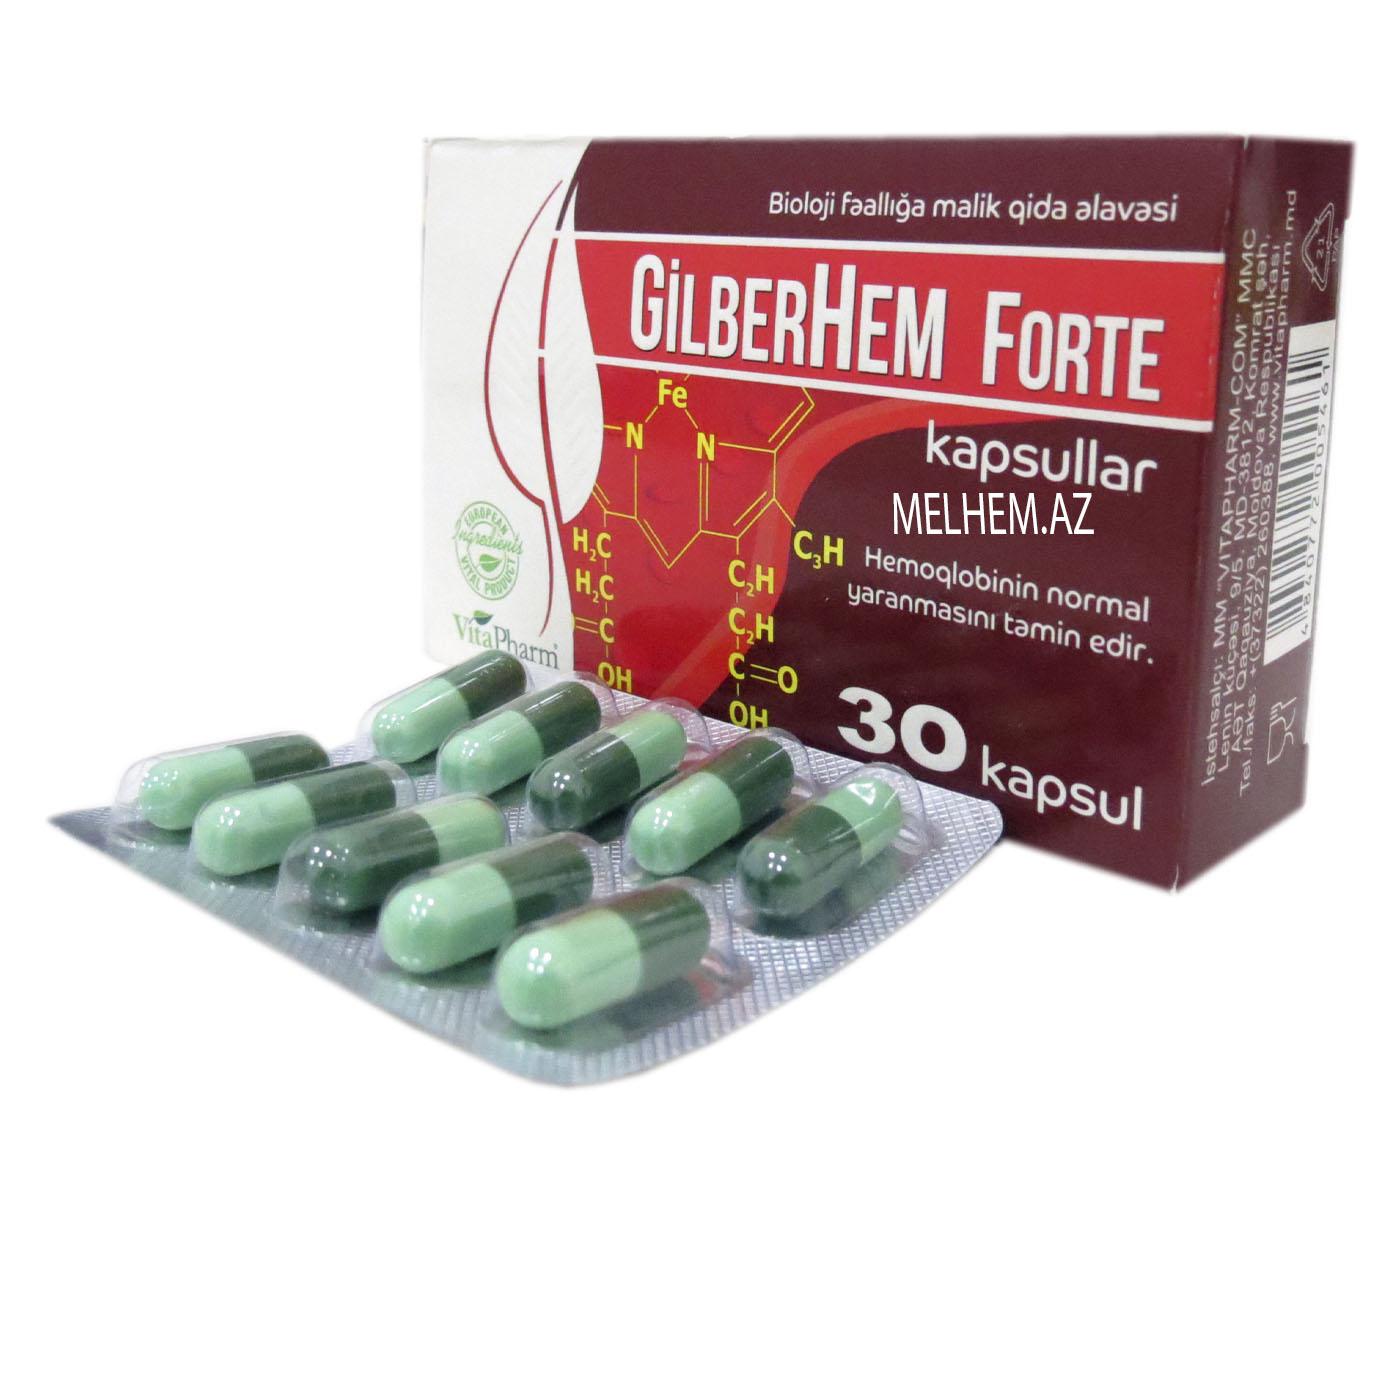 GILBERHEM FORTE